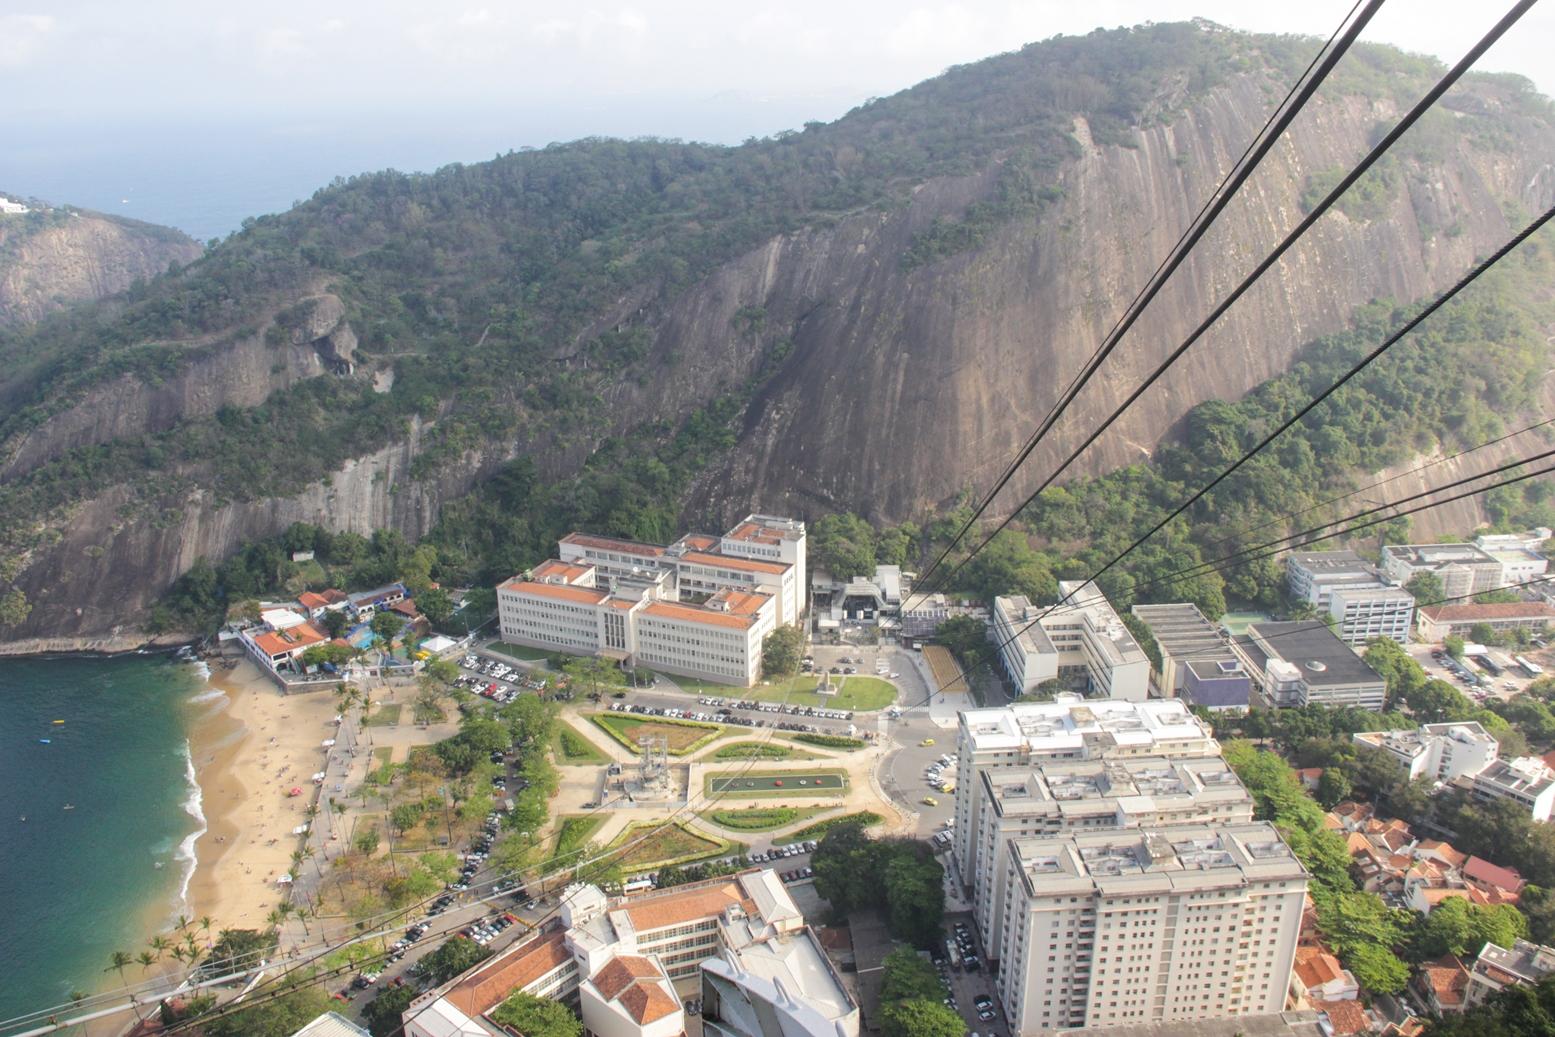 -week-rio-reach-sugarloaf-mountain-peak-cable-car-2-jpg